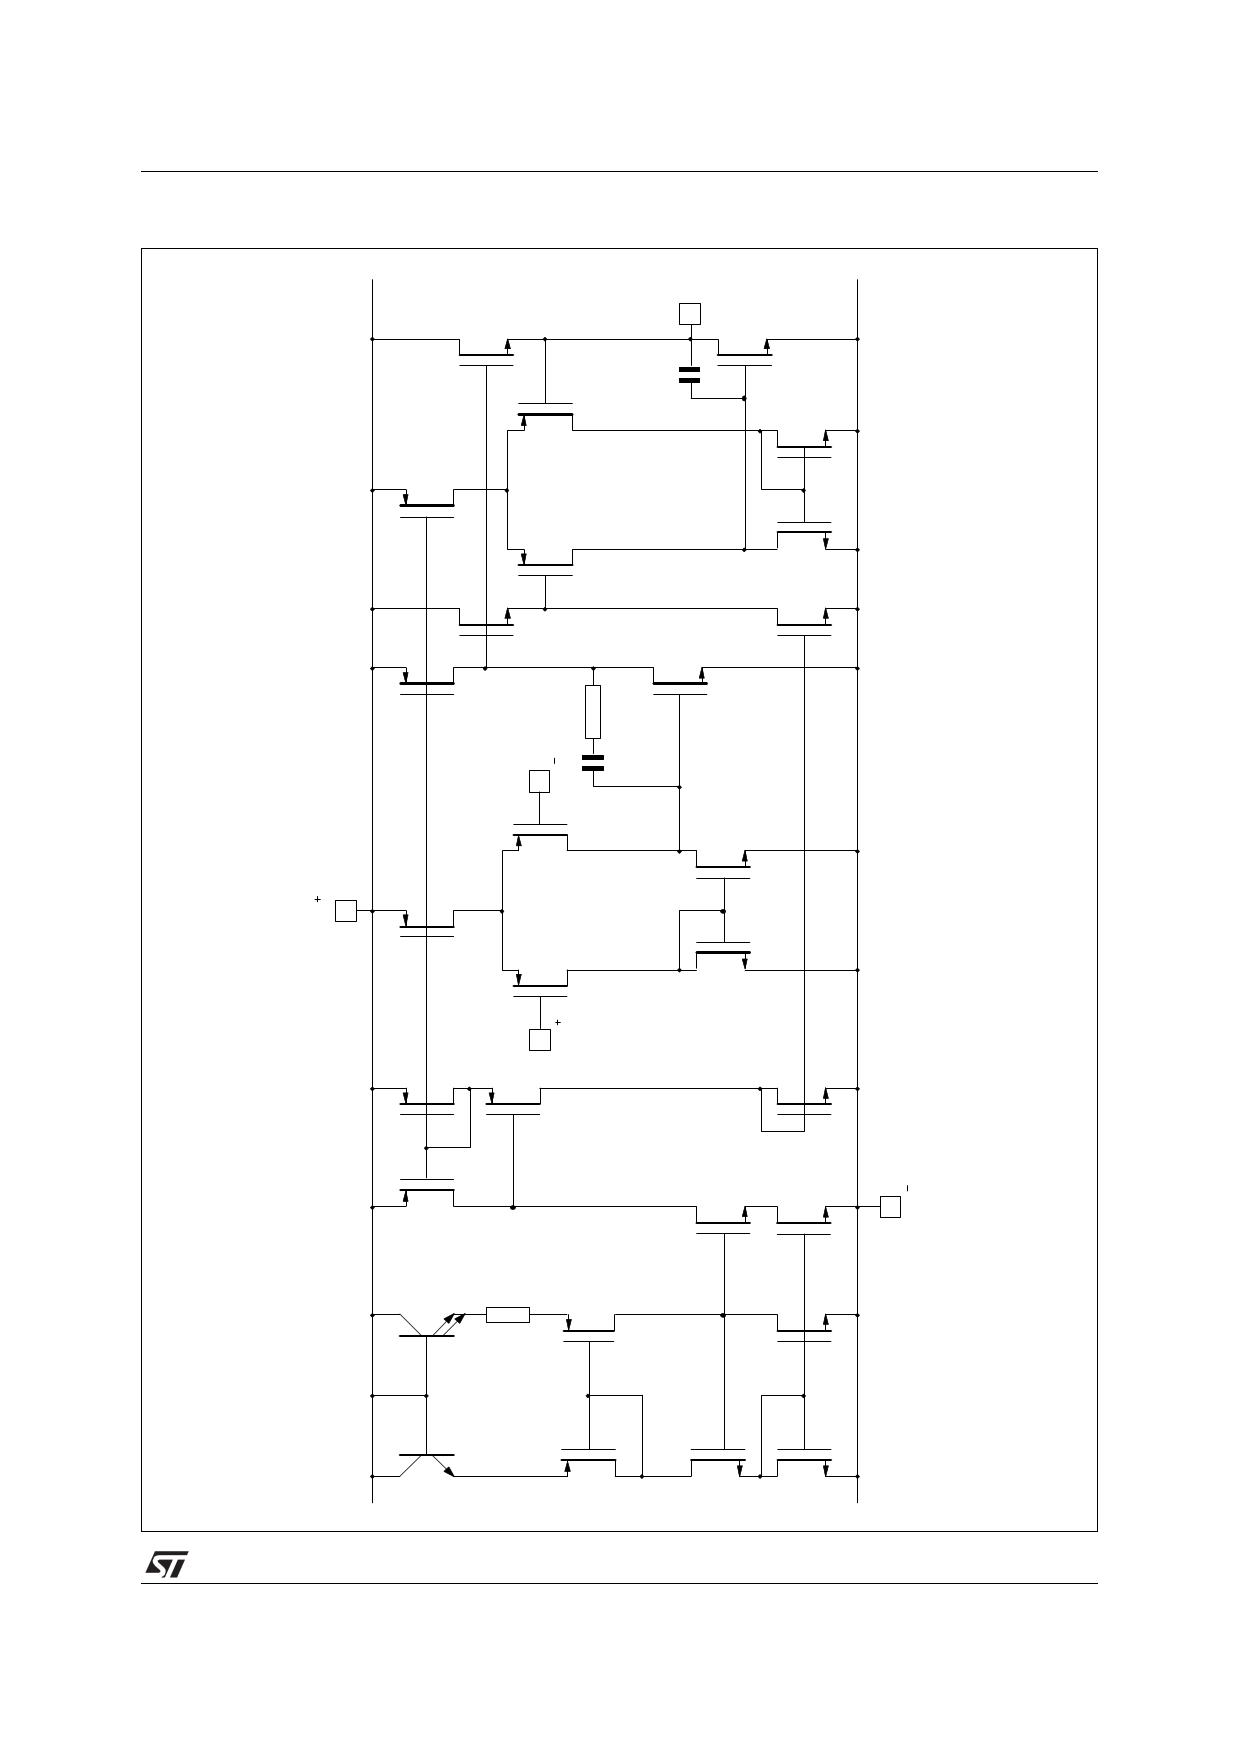 TS272AM pdf, ピン配列